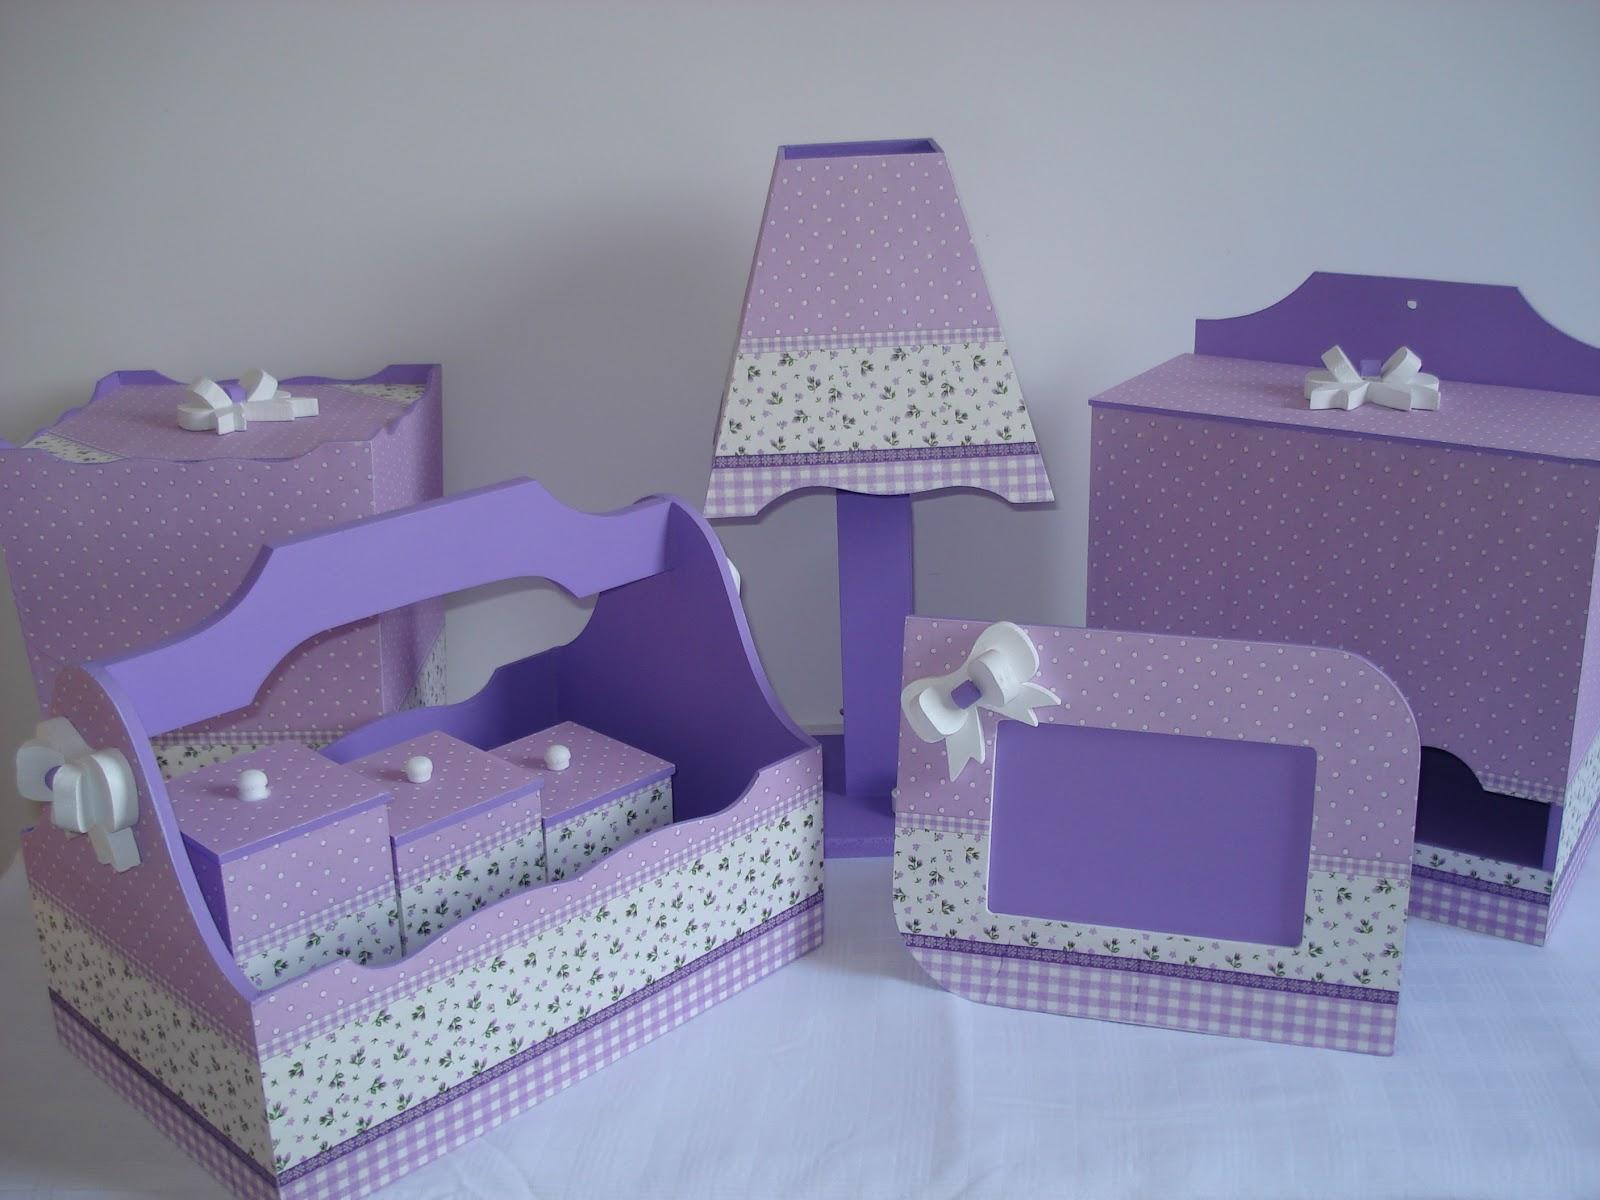 kits bebes kits bebes kits bebes kits bebes #443573 1600x1200